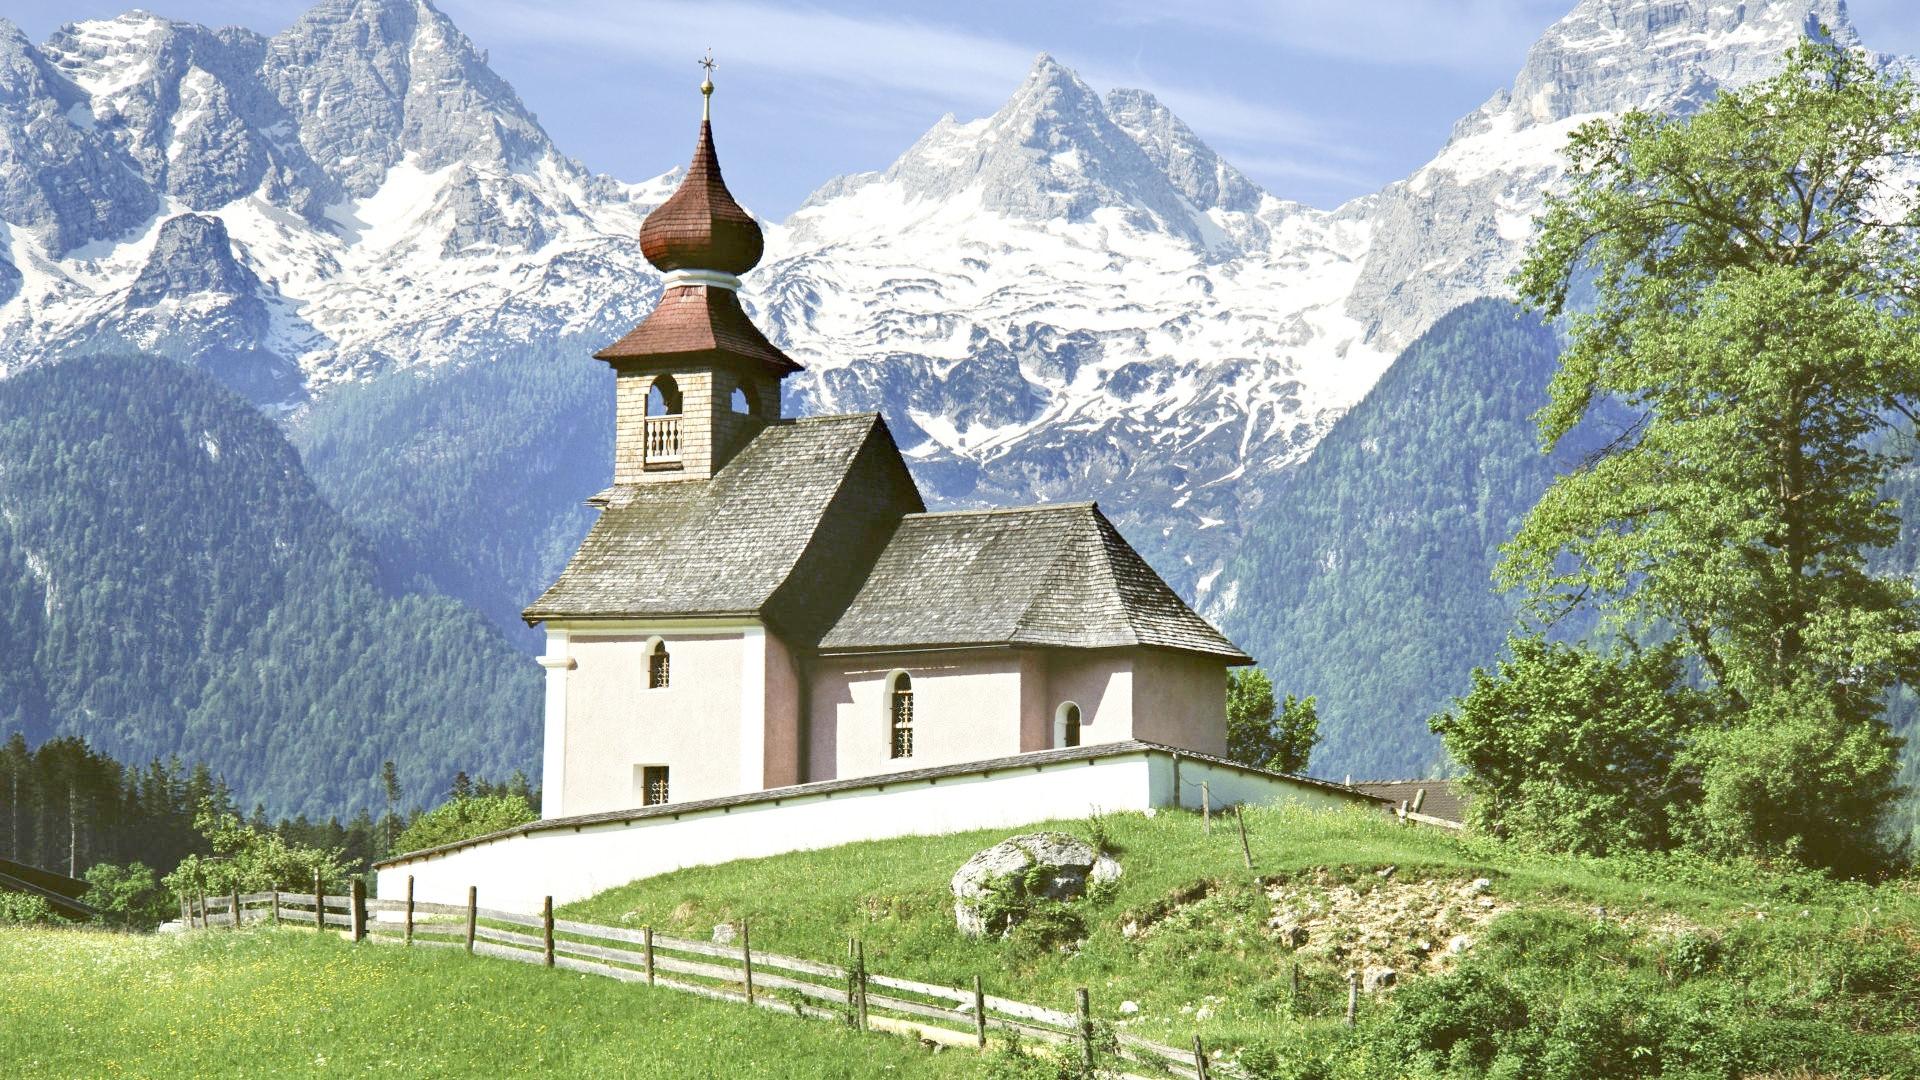 salzburg-austria-9.jpg